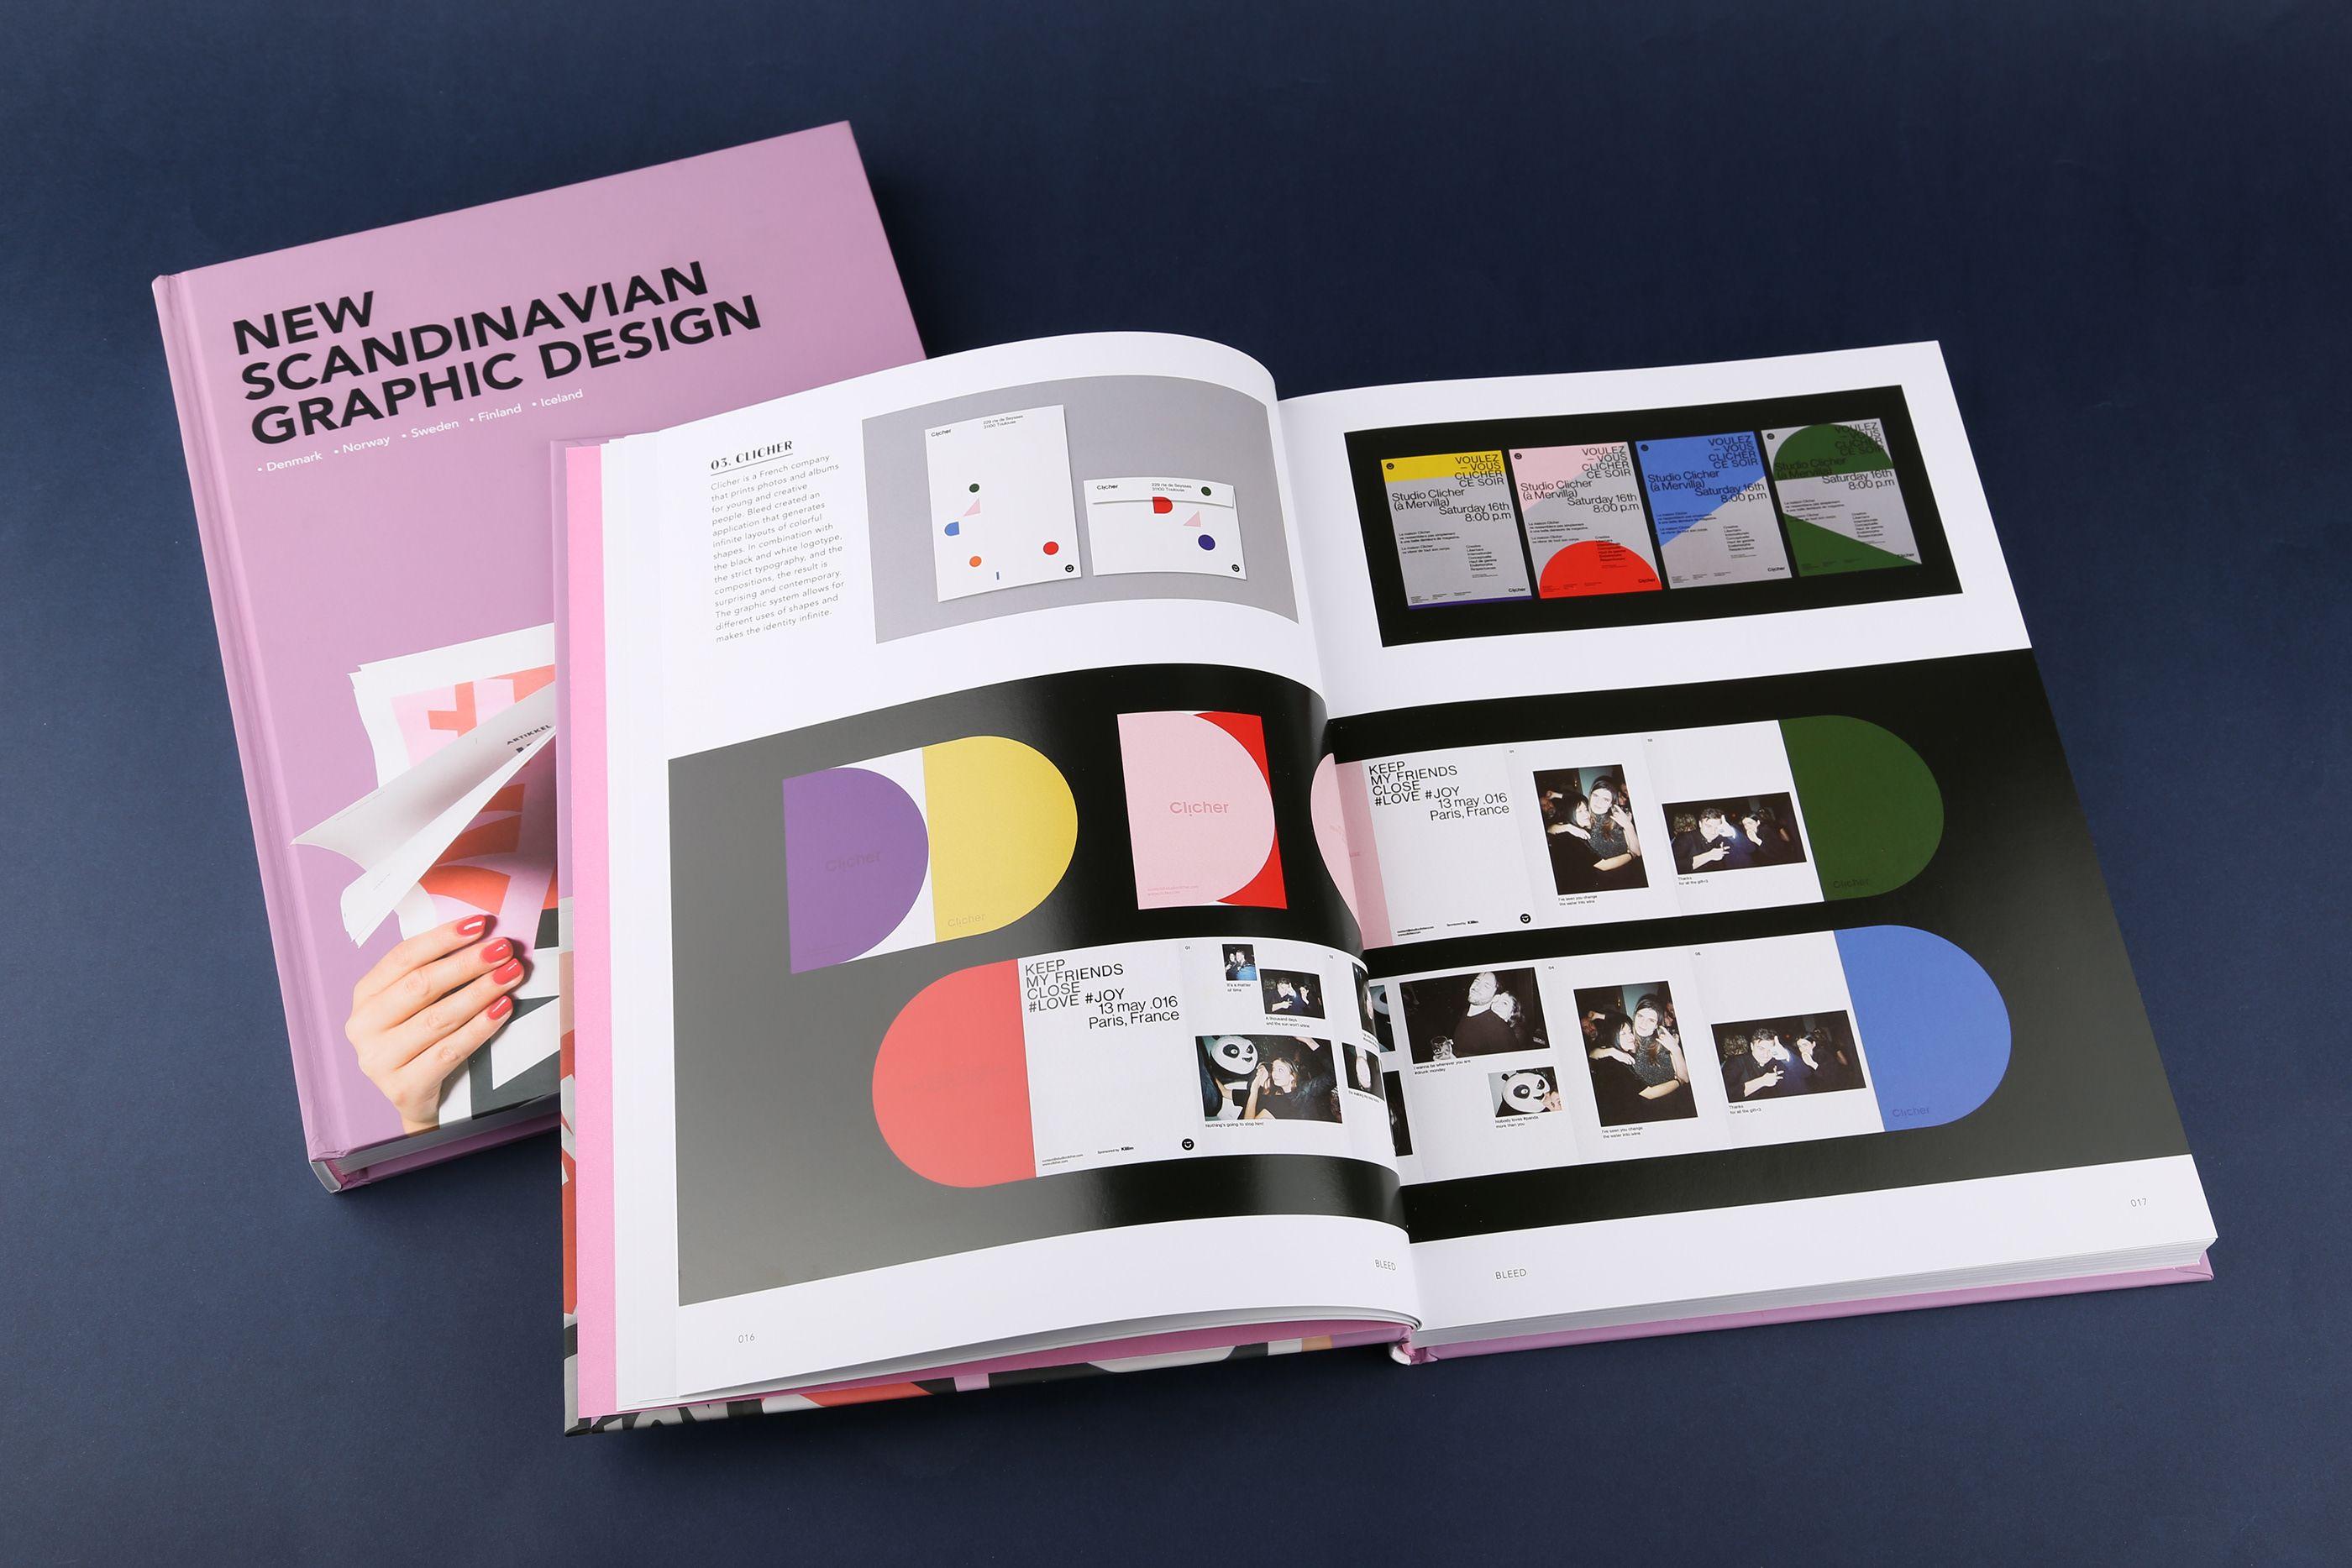 New Scandinavian Graphic Design On Behance Graphic Design Book Design Design